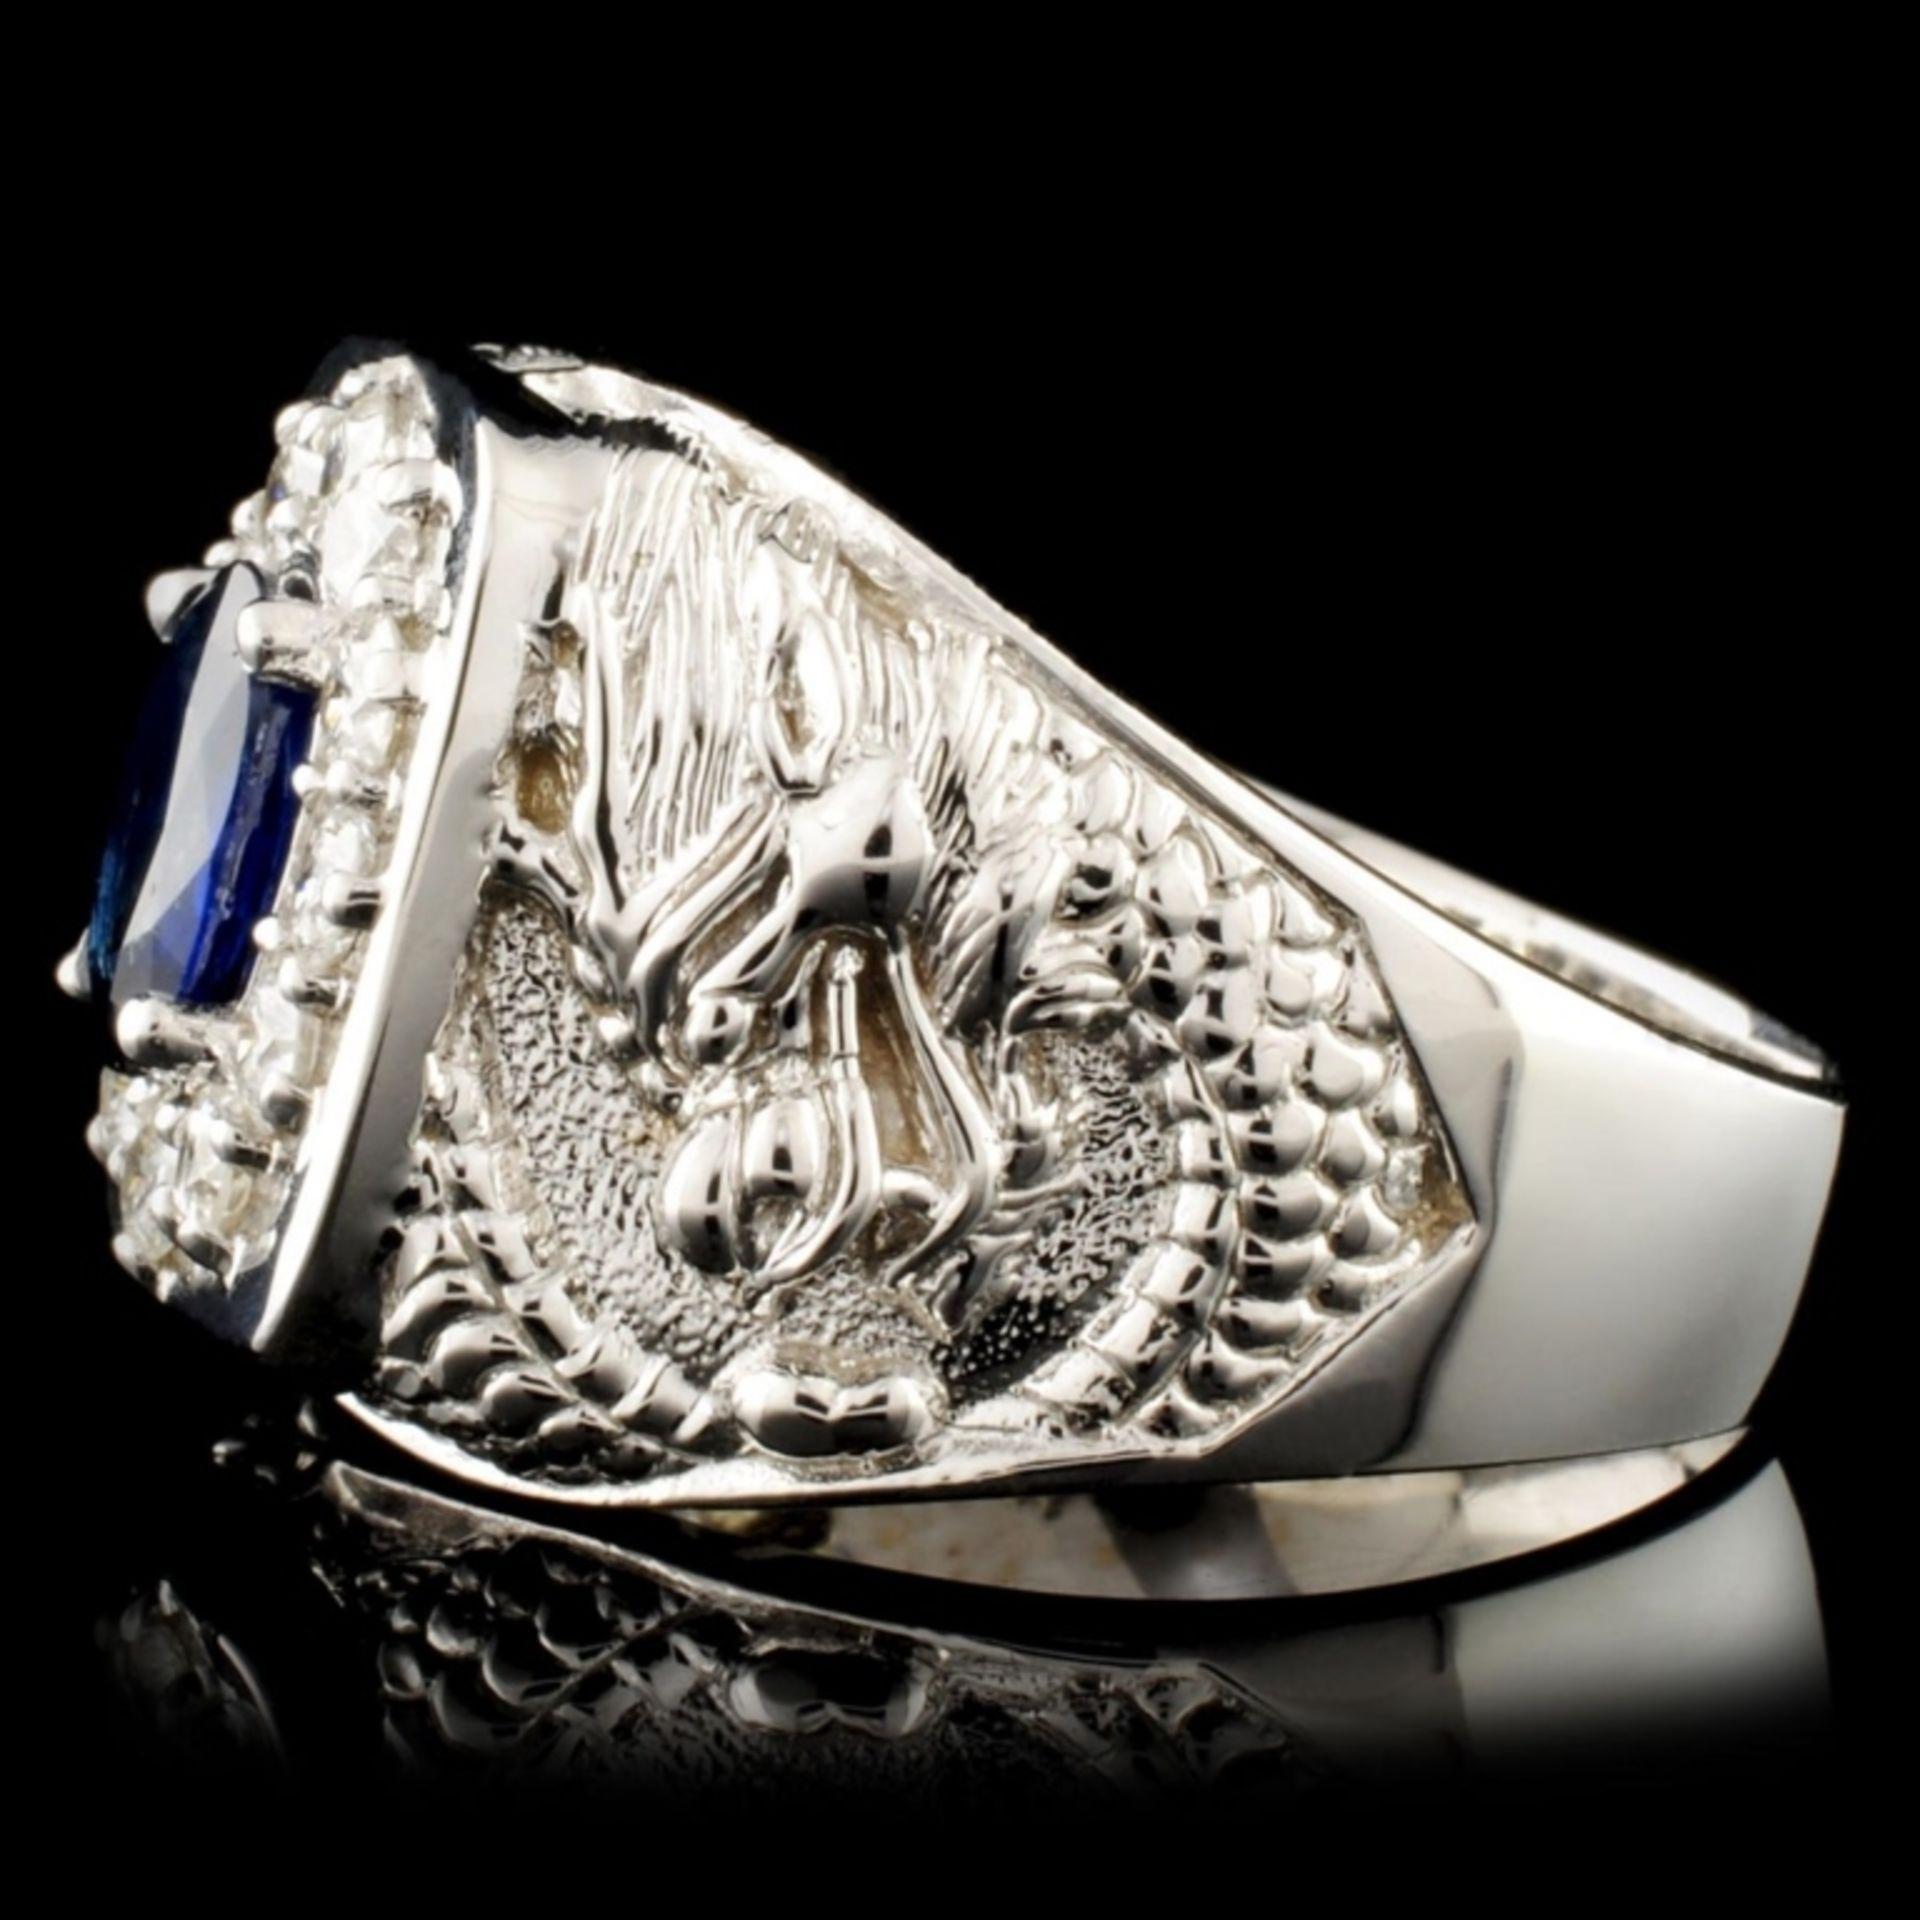 14K Gold 2.00ct Sapphire & 0.90ctw Diamond Ring - Image 4 of 5